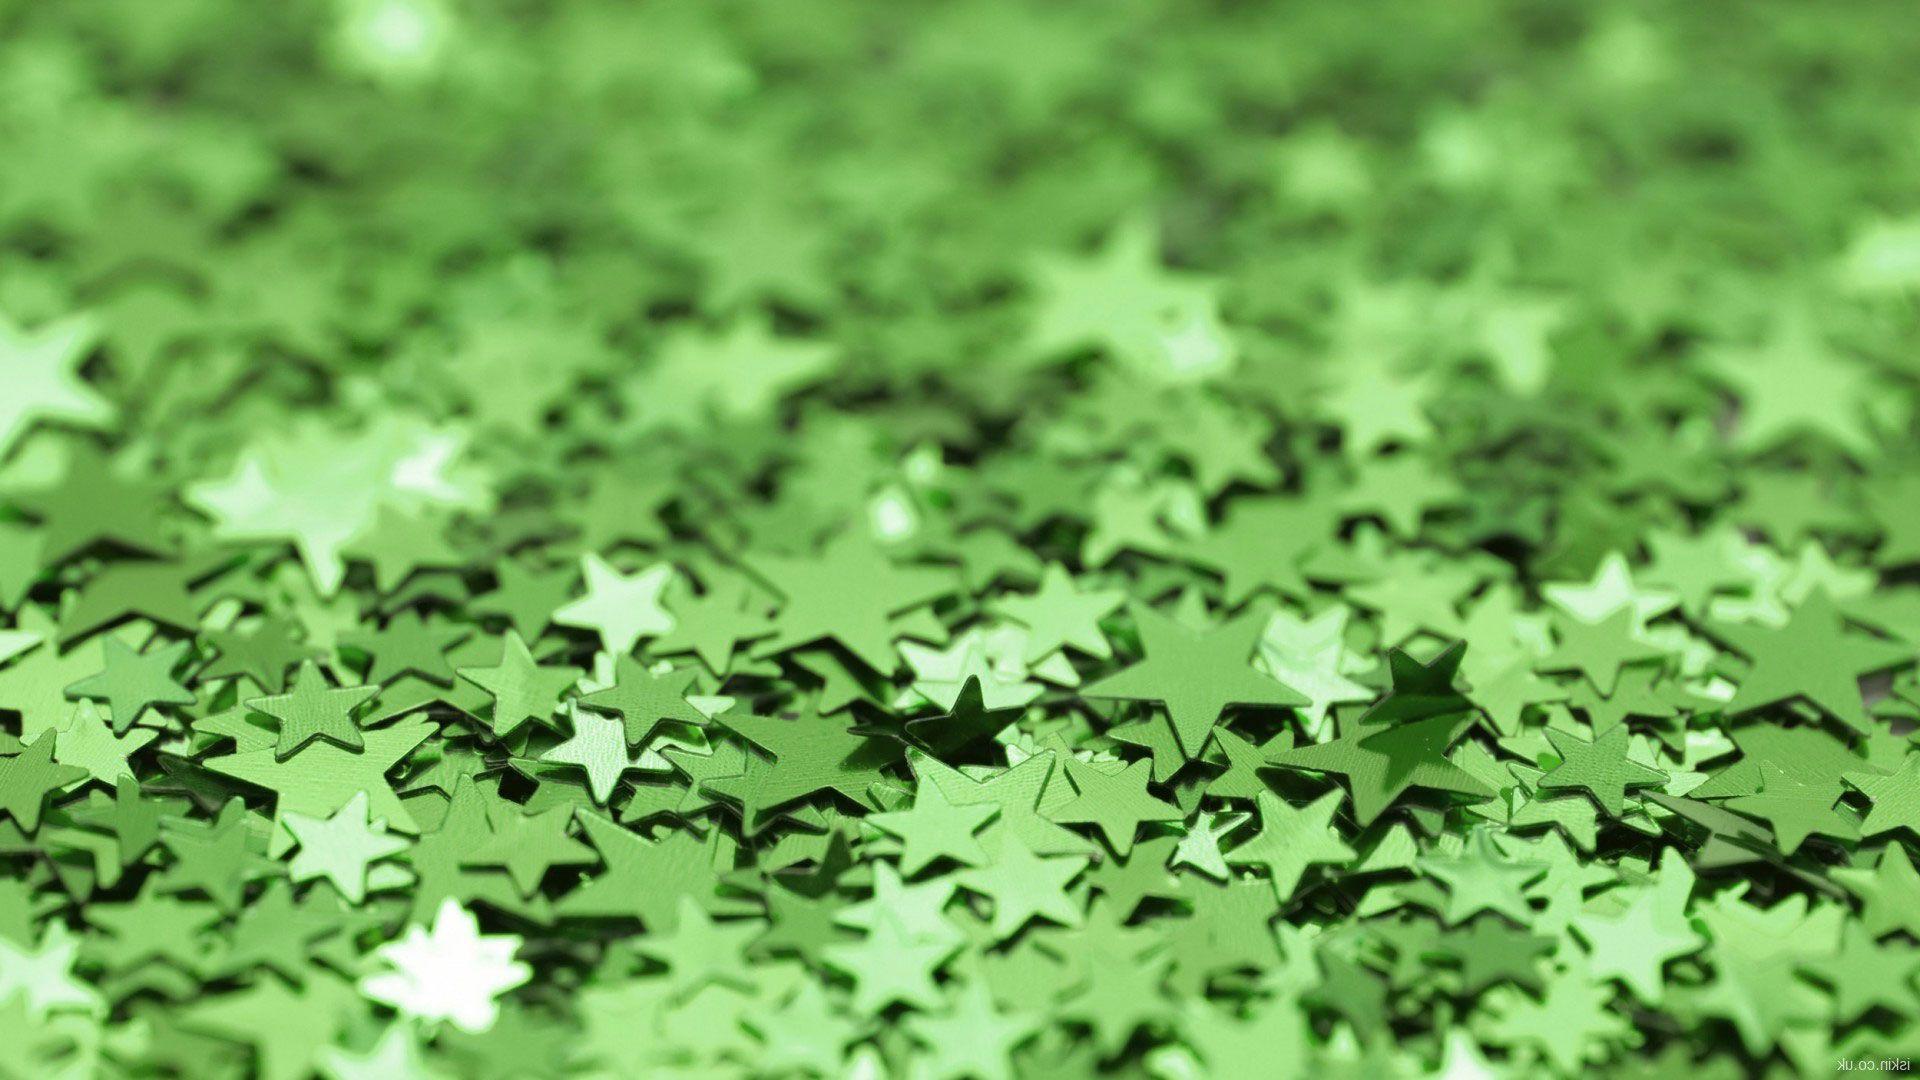 Mint Green wallpaper picture hd